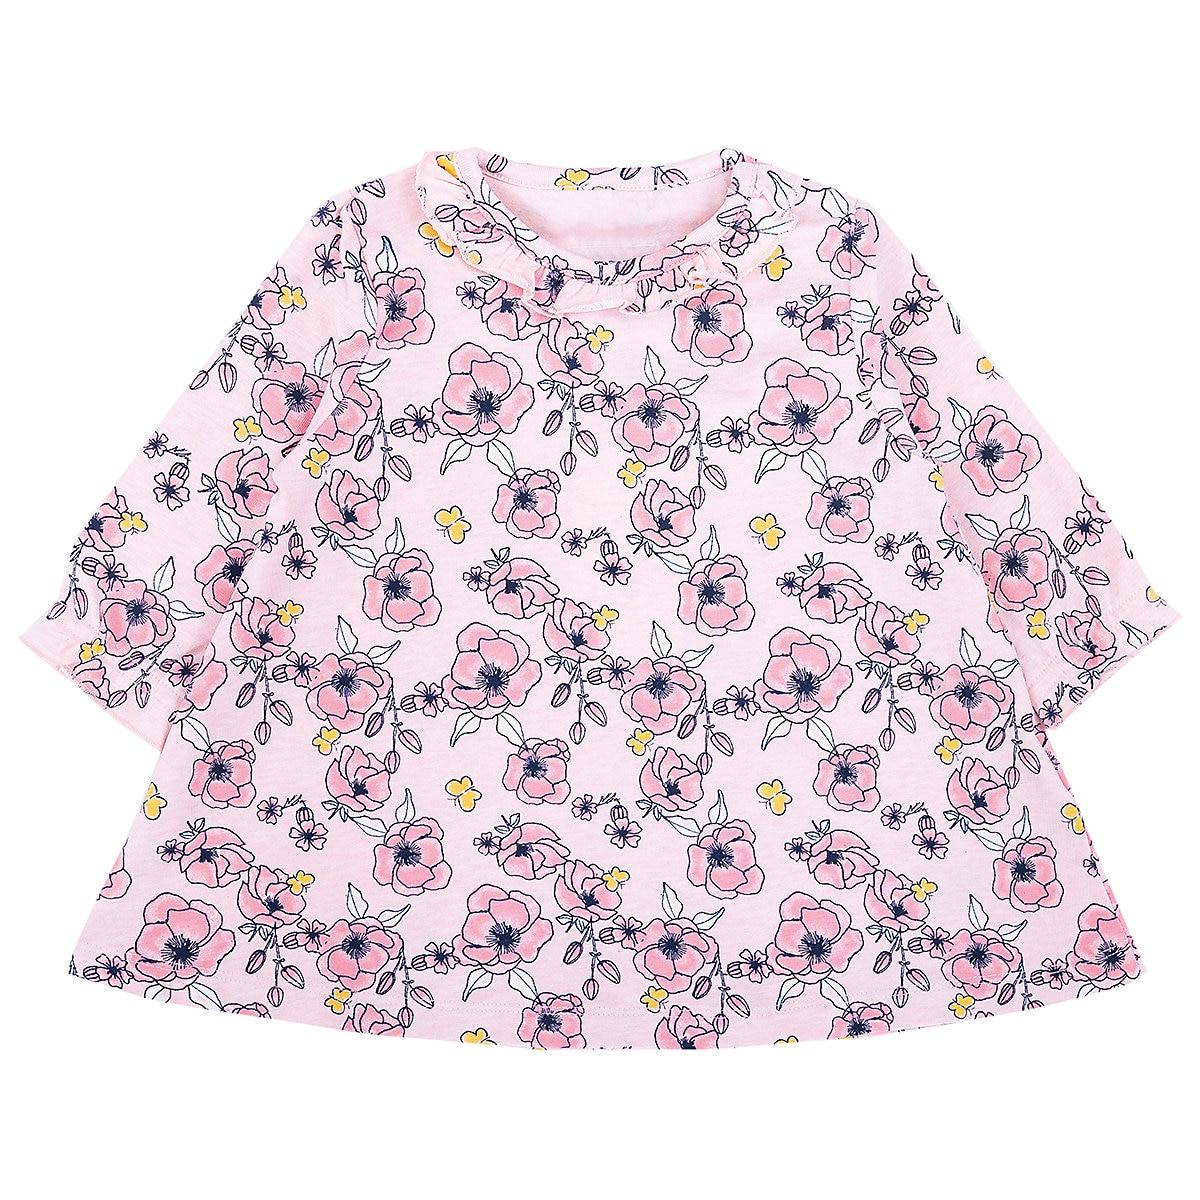 Фото - NAME IT Dresses 10624768 dress for girls baby clothing name it dresses 10626724 dress for girls baby clothing